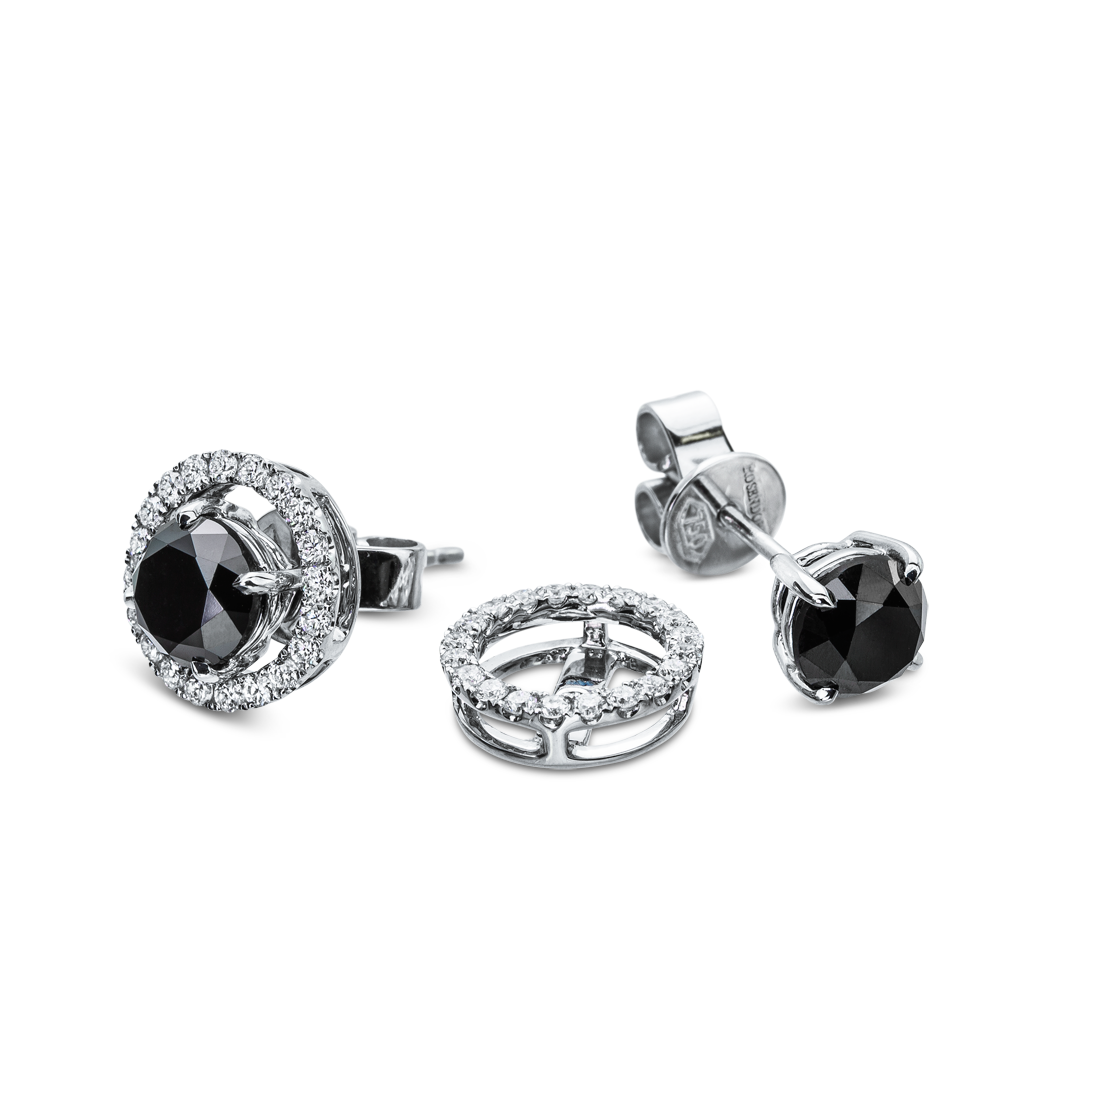 Rosendorff Essentials Collection Black Diamond Stud Earrings with Removable Diamond Halo